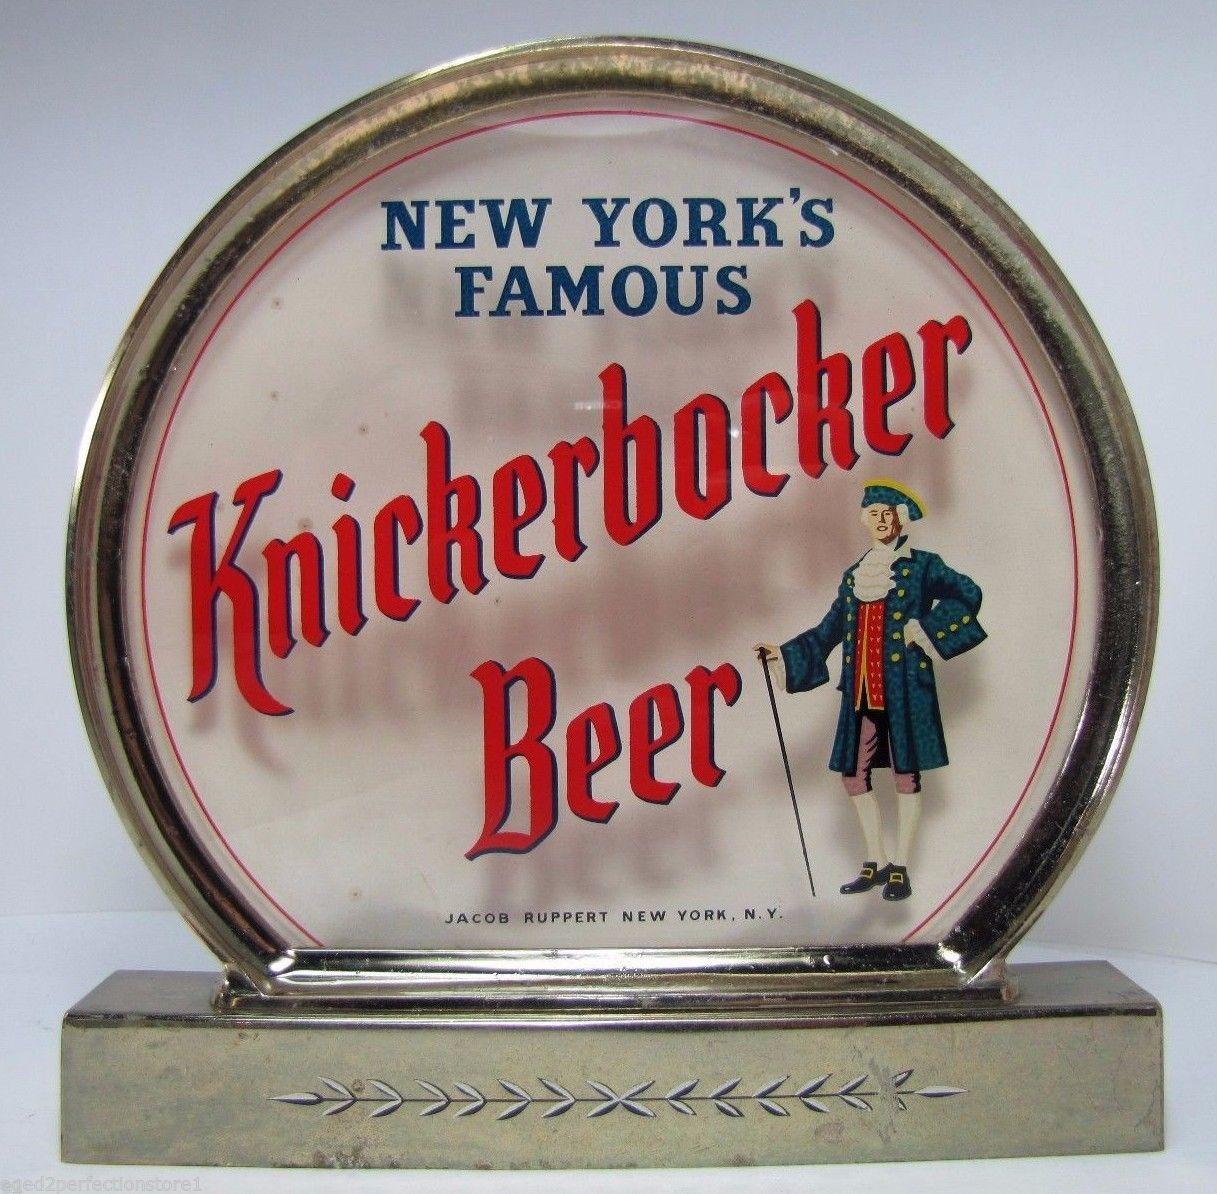 Knickerbocker Beer Cash Register Lighted Sign, Jacob Ruppert Brewery, New York, NY